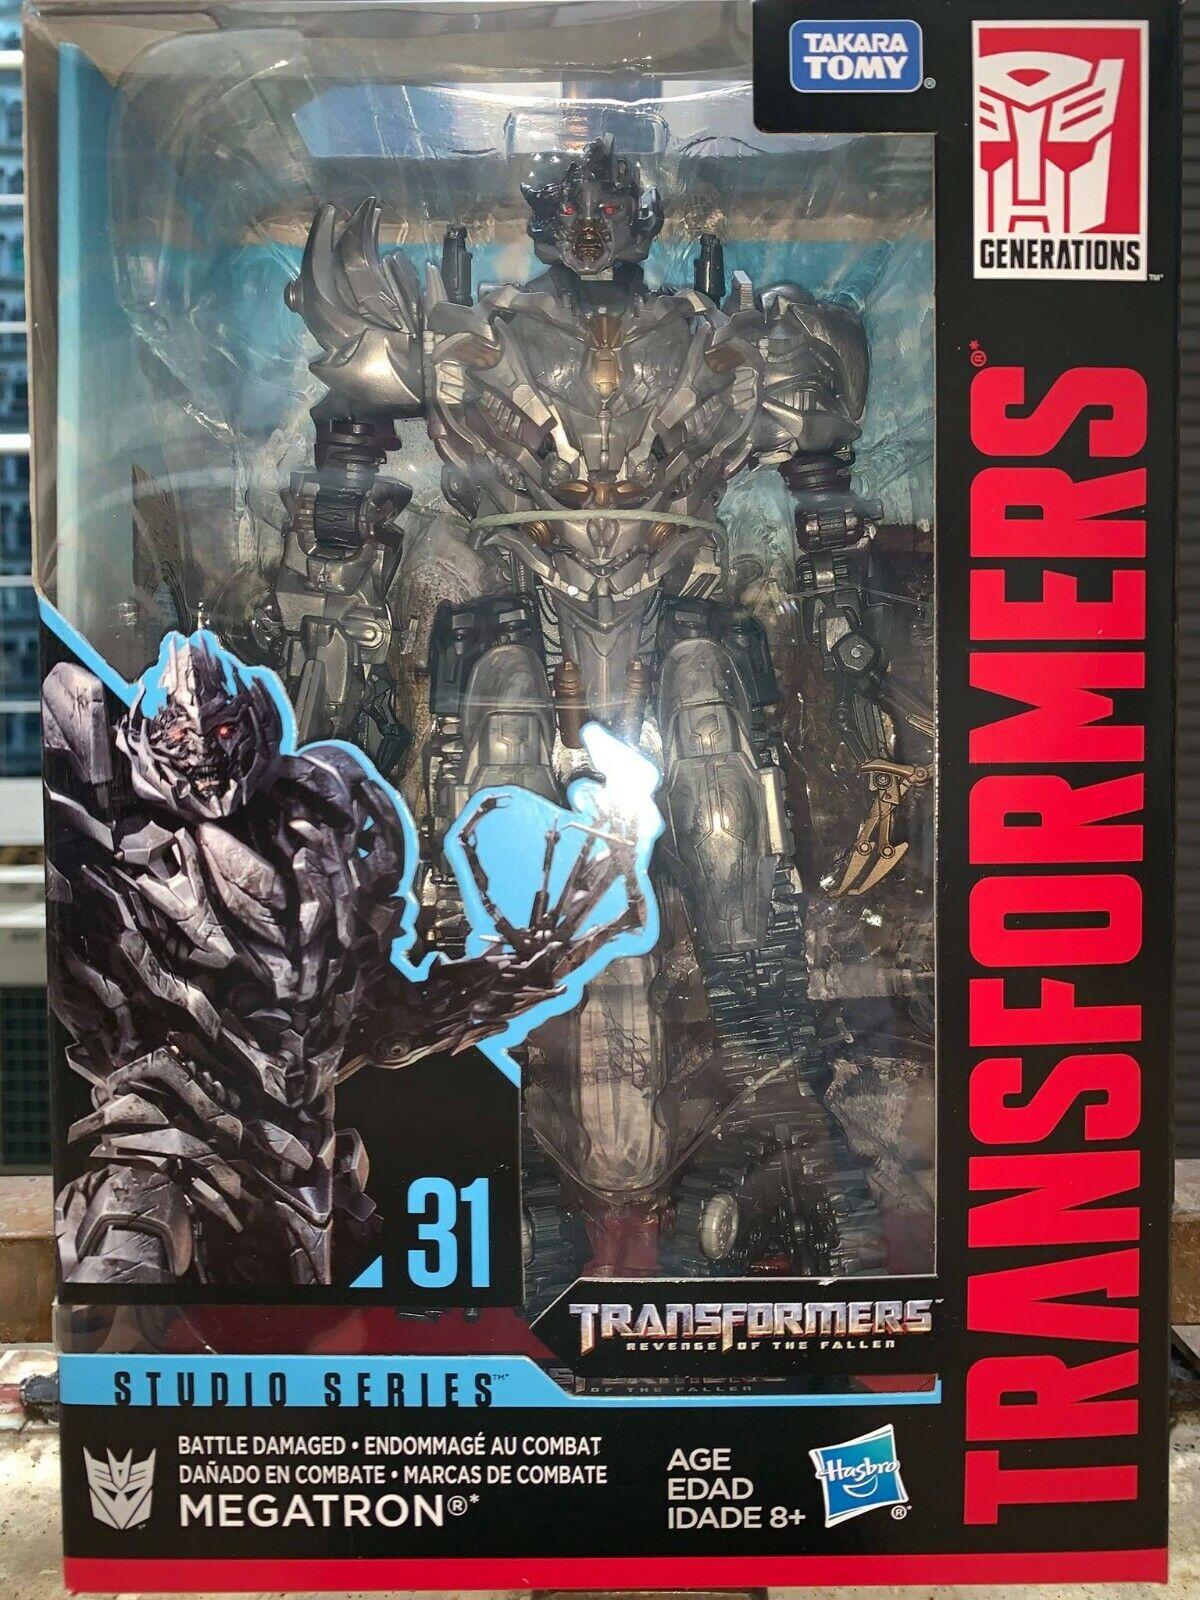 Transformers Studio Series SS-31 battle Damaged Megatron Exclusive Brand New